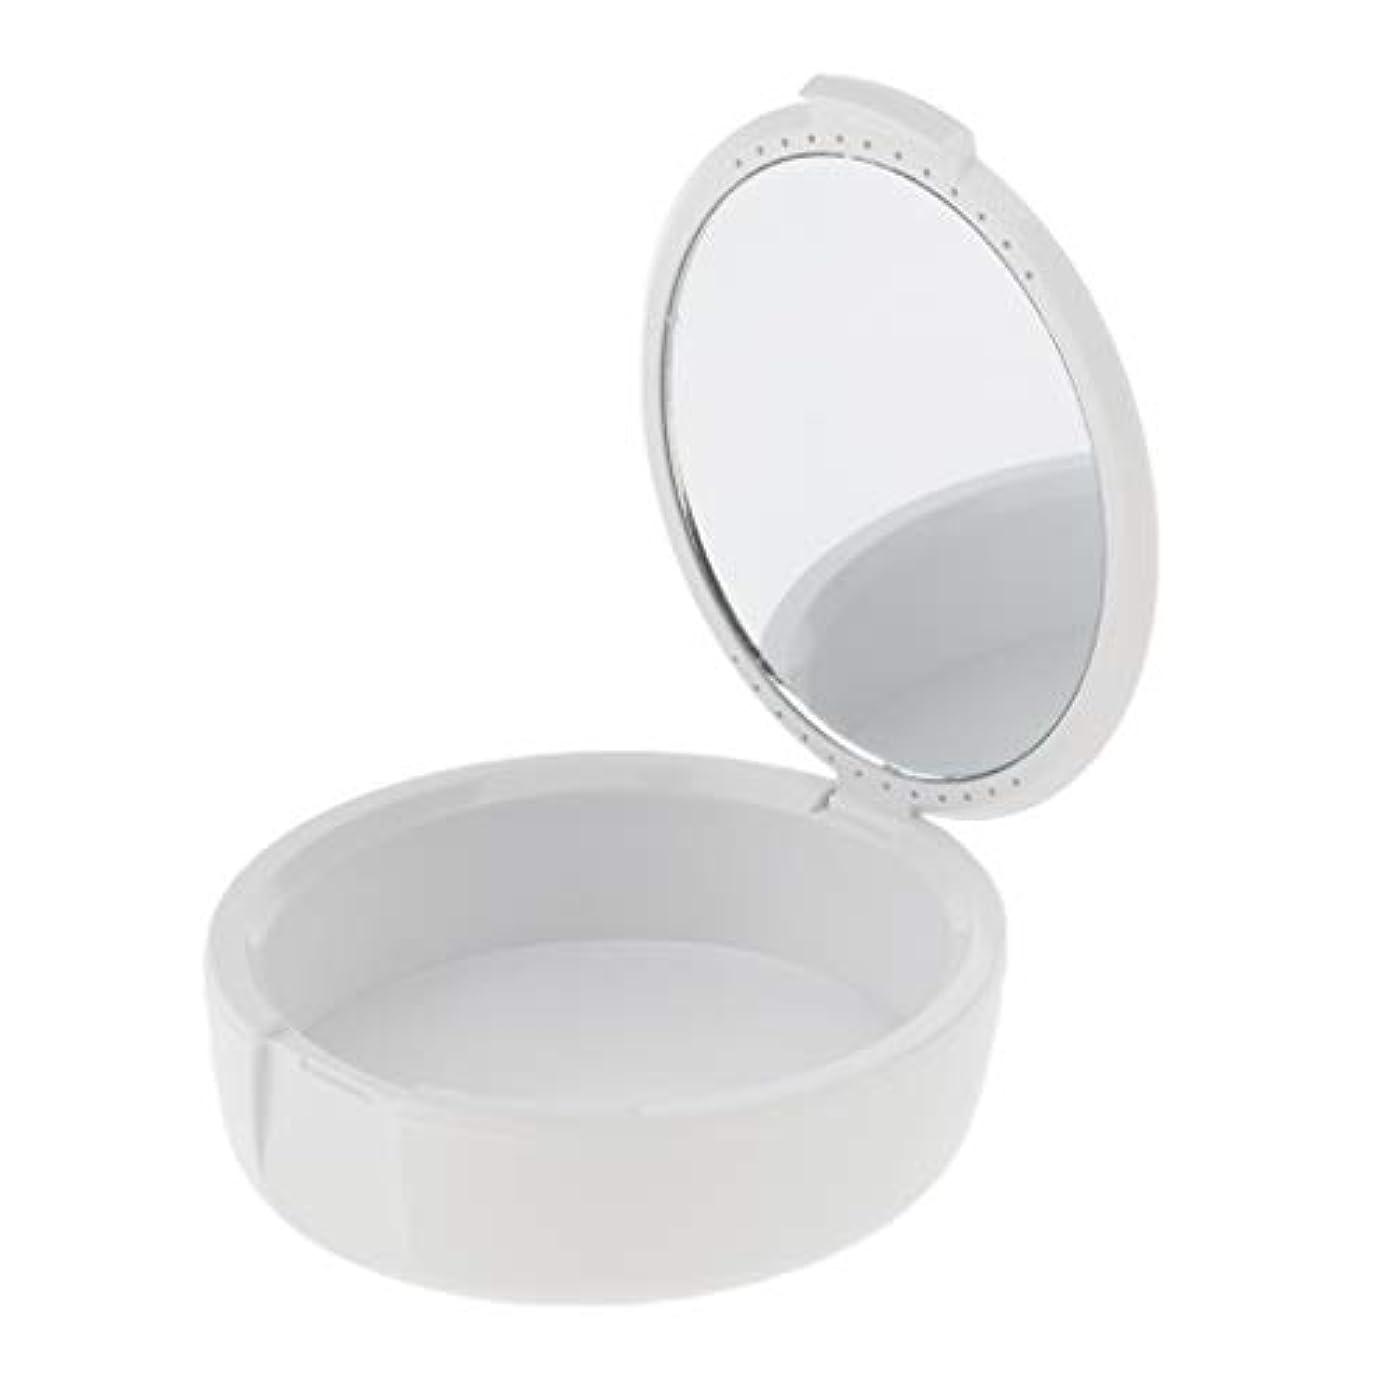 CUTICATE マウスガードケース 義歯収納容器 ミニ 携帯用 2色選べ - 白